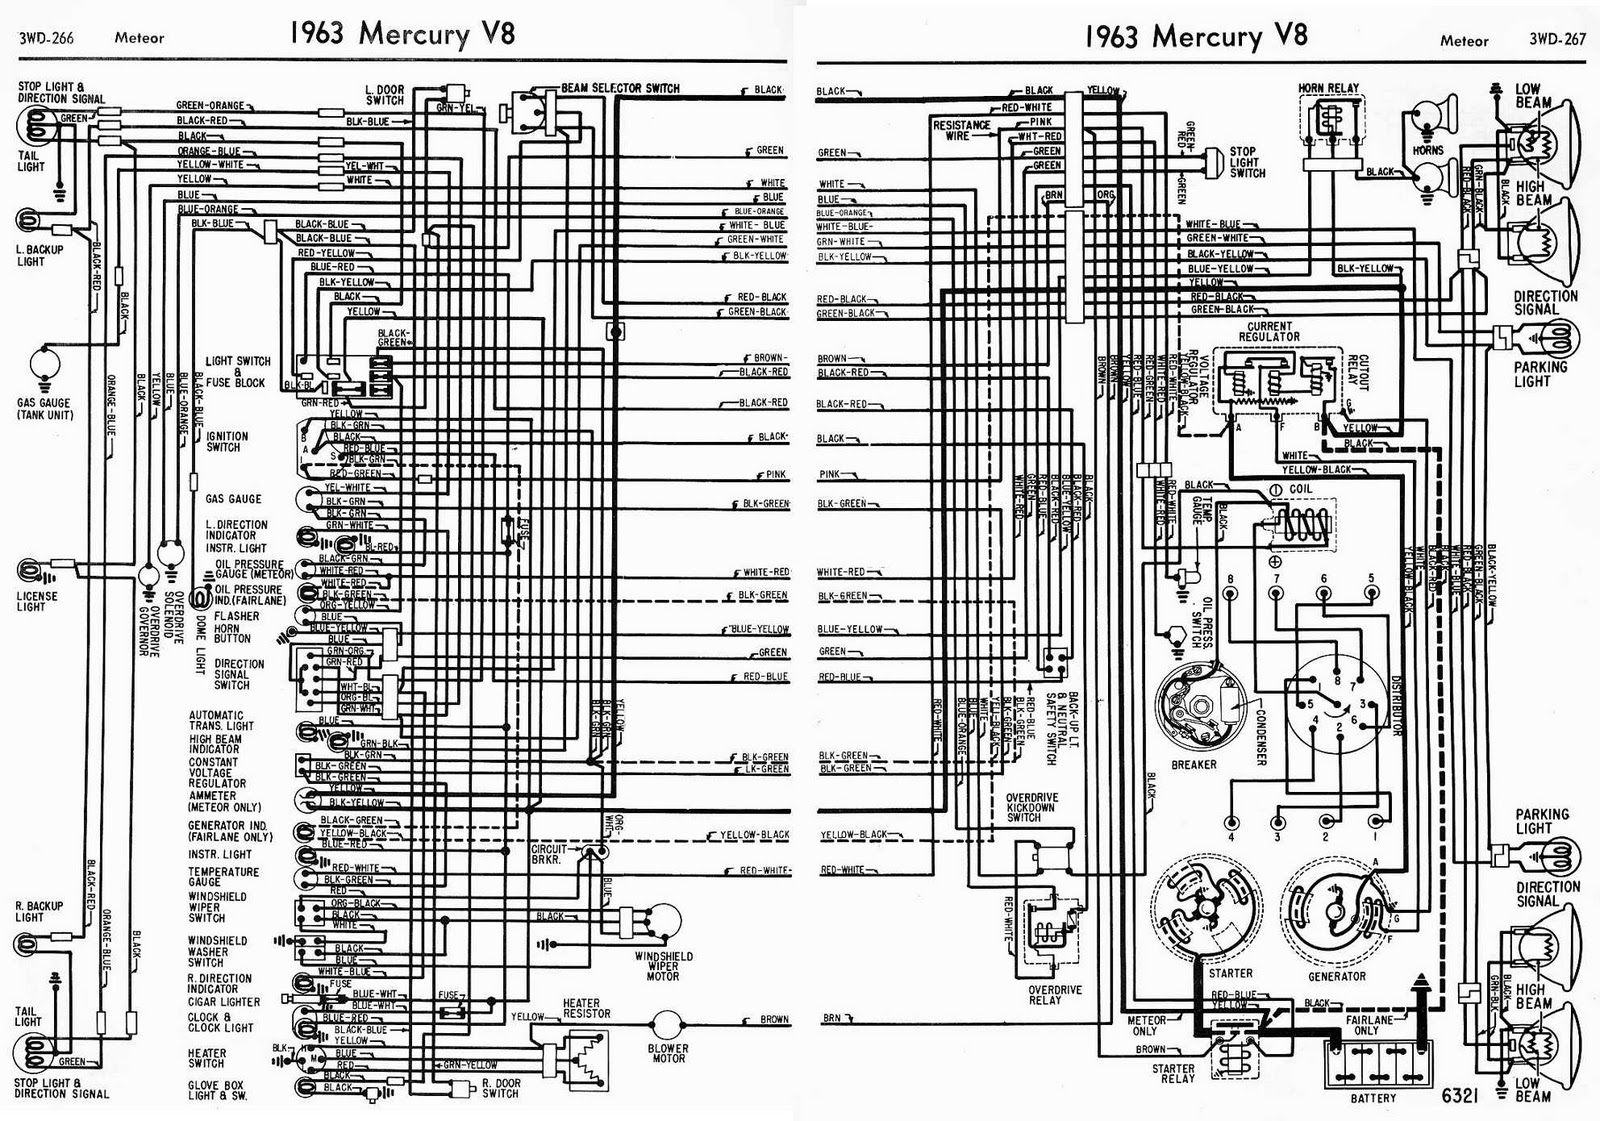 Unique 1972 Honda Cb350 Wiring Diagram Ensign - Electrical and ...